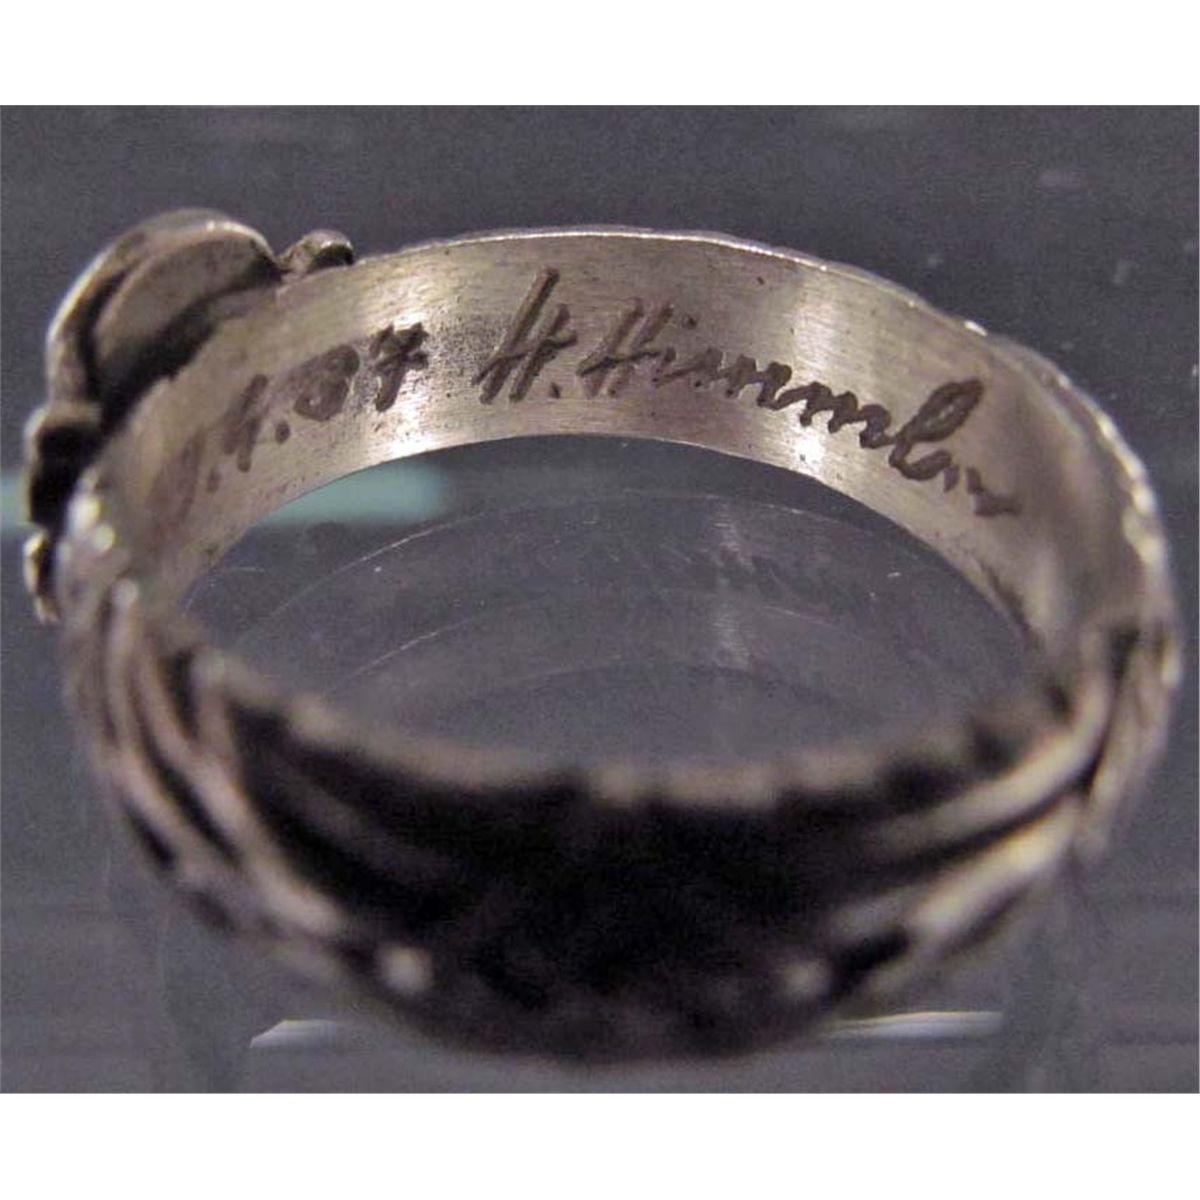 Image 7 German Ss Wedding Ring W Himmler Signature Inside Band Sterling